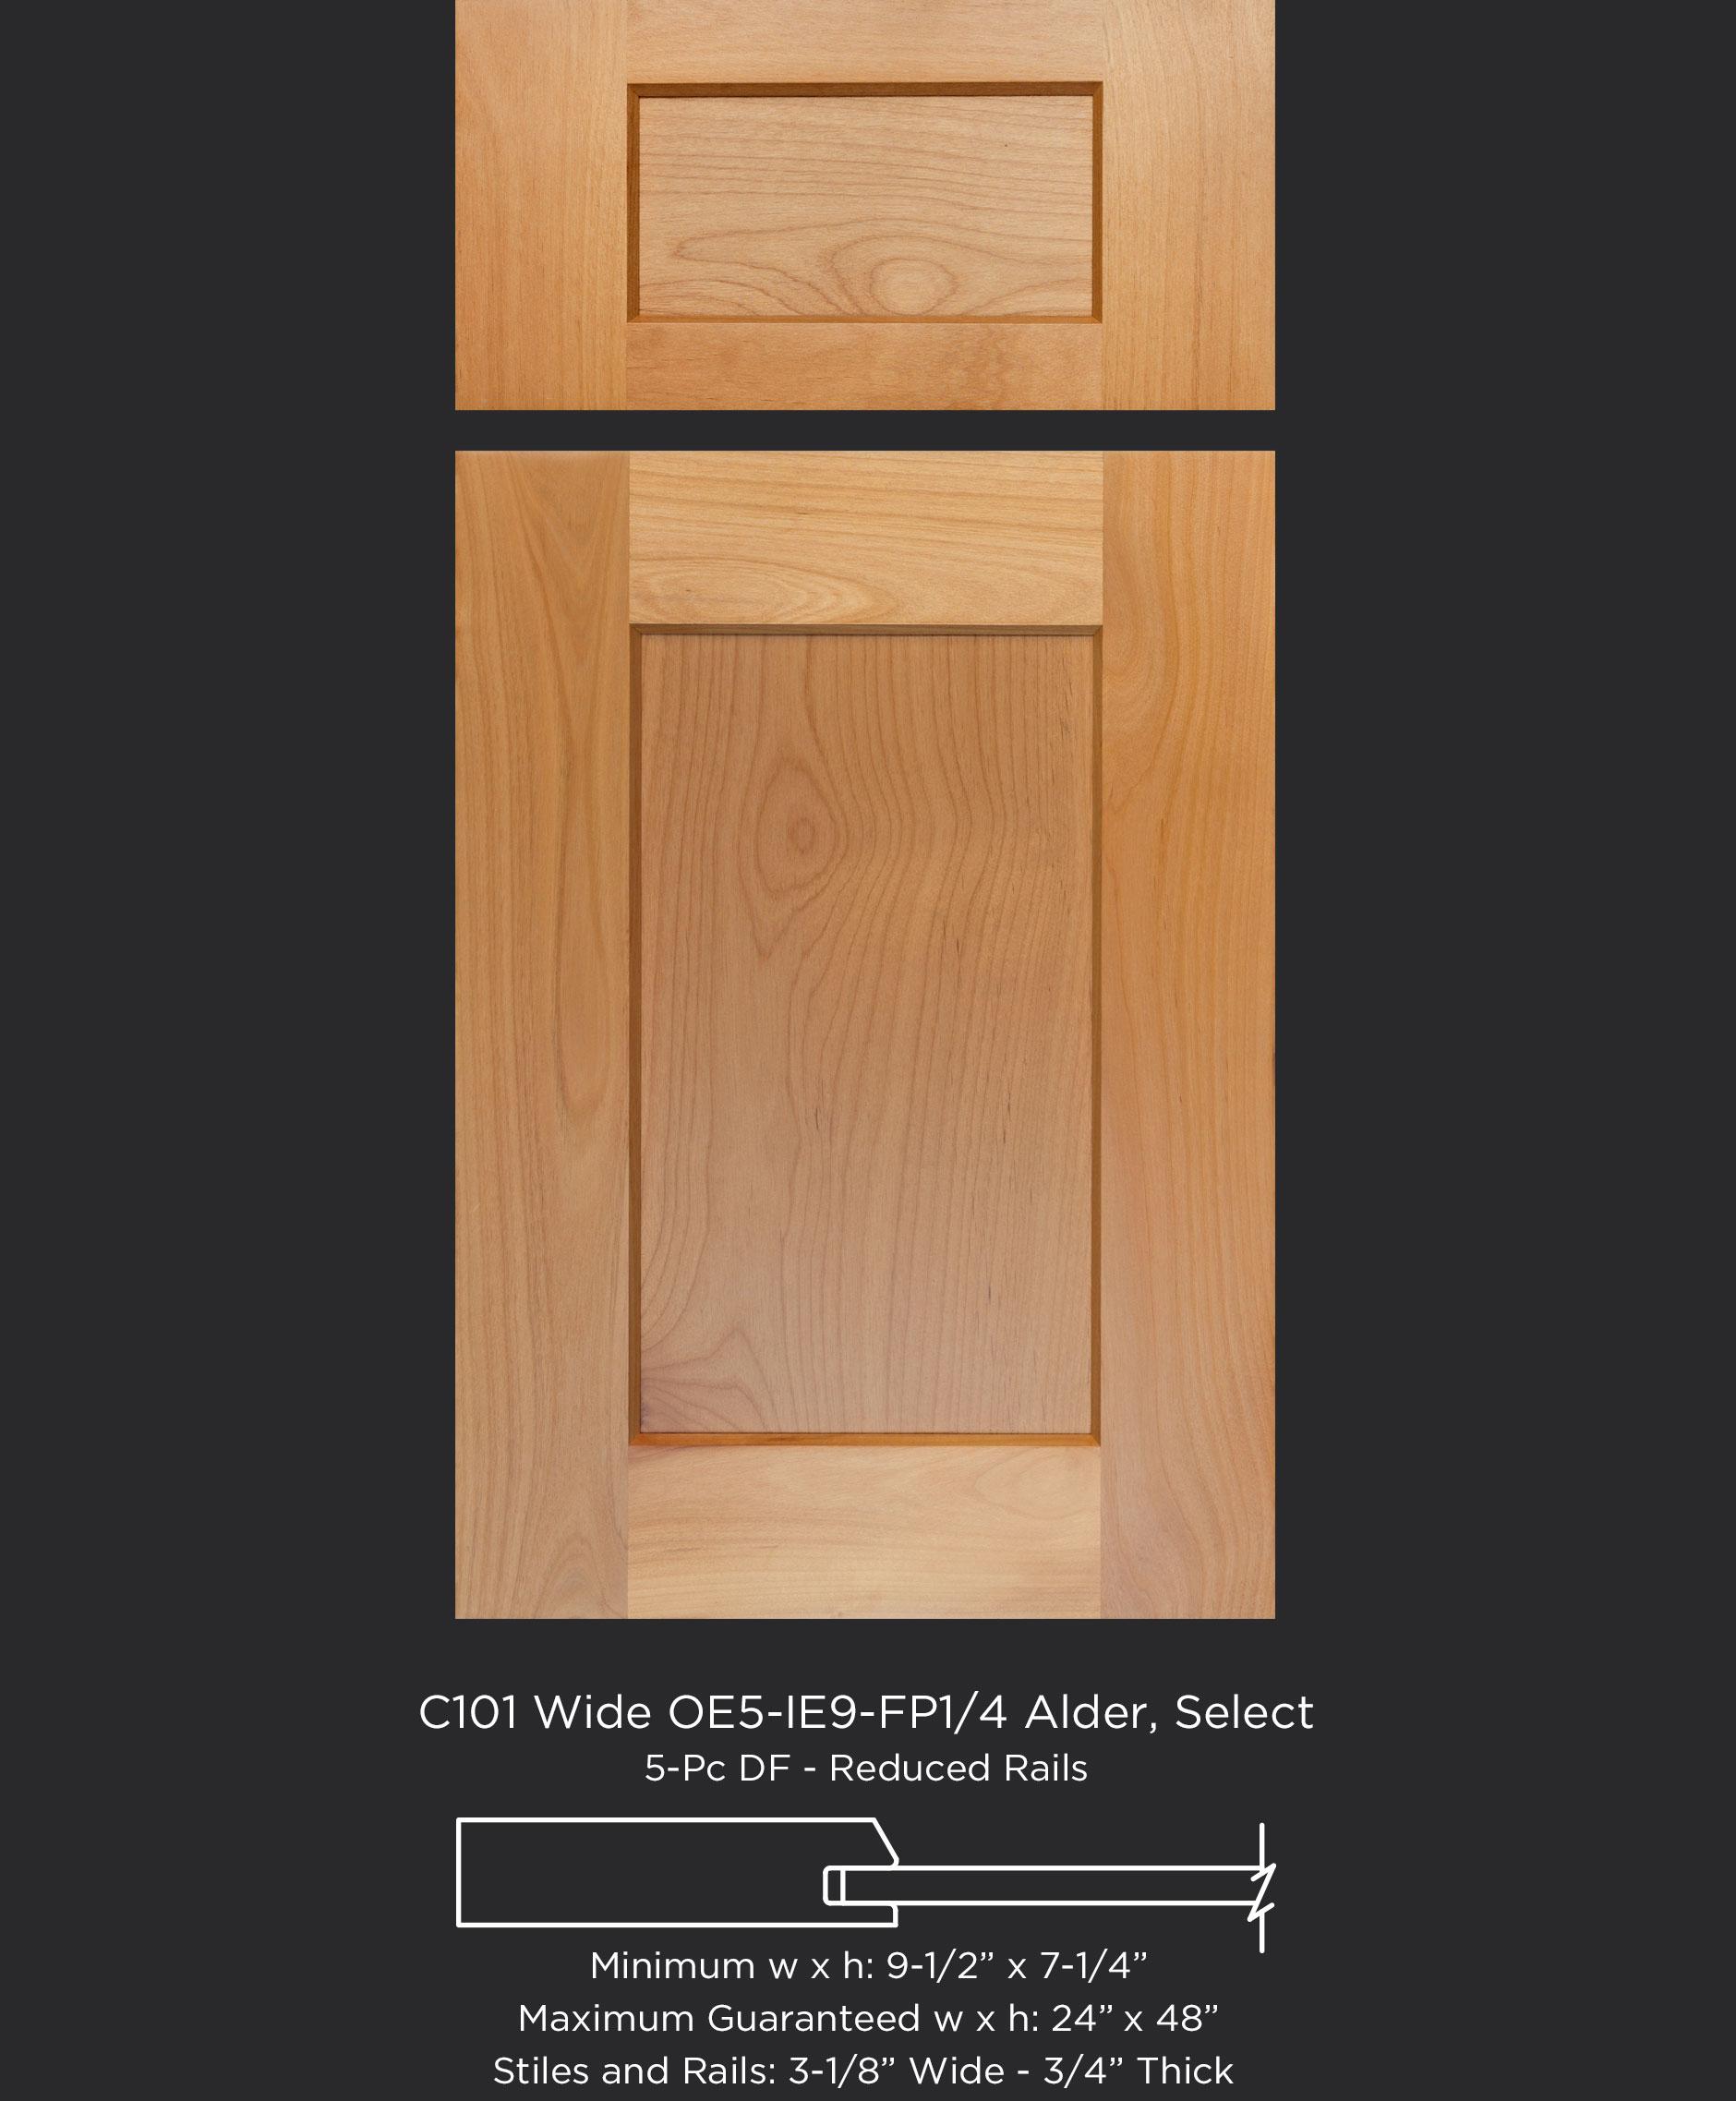 Cope and Stick Cabinet Door C101 Wide OE5-IE9-FP1/4 Alder Select